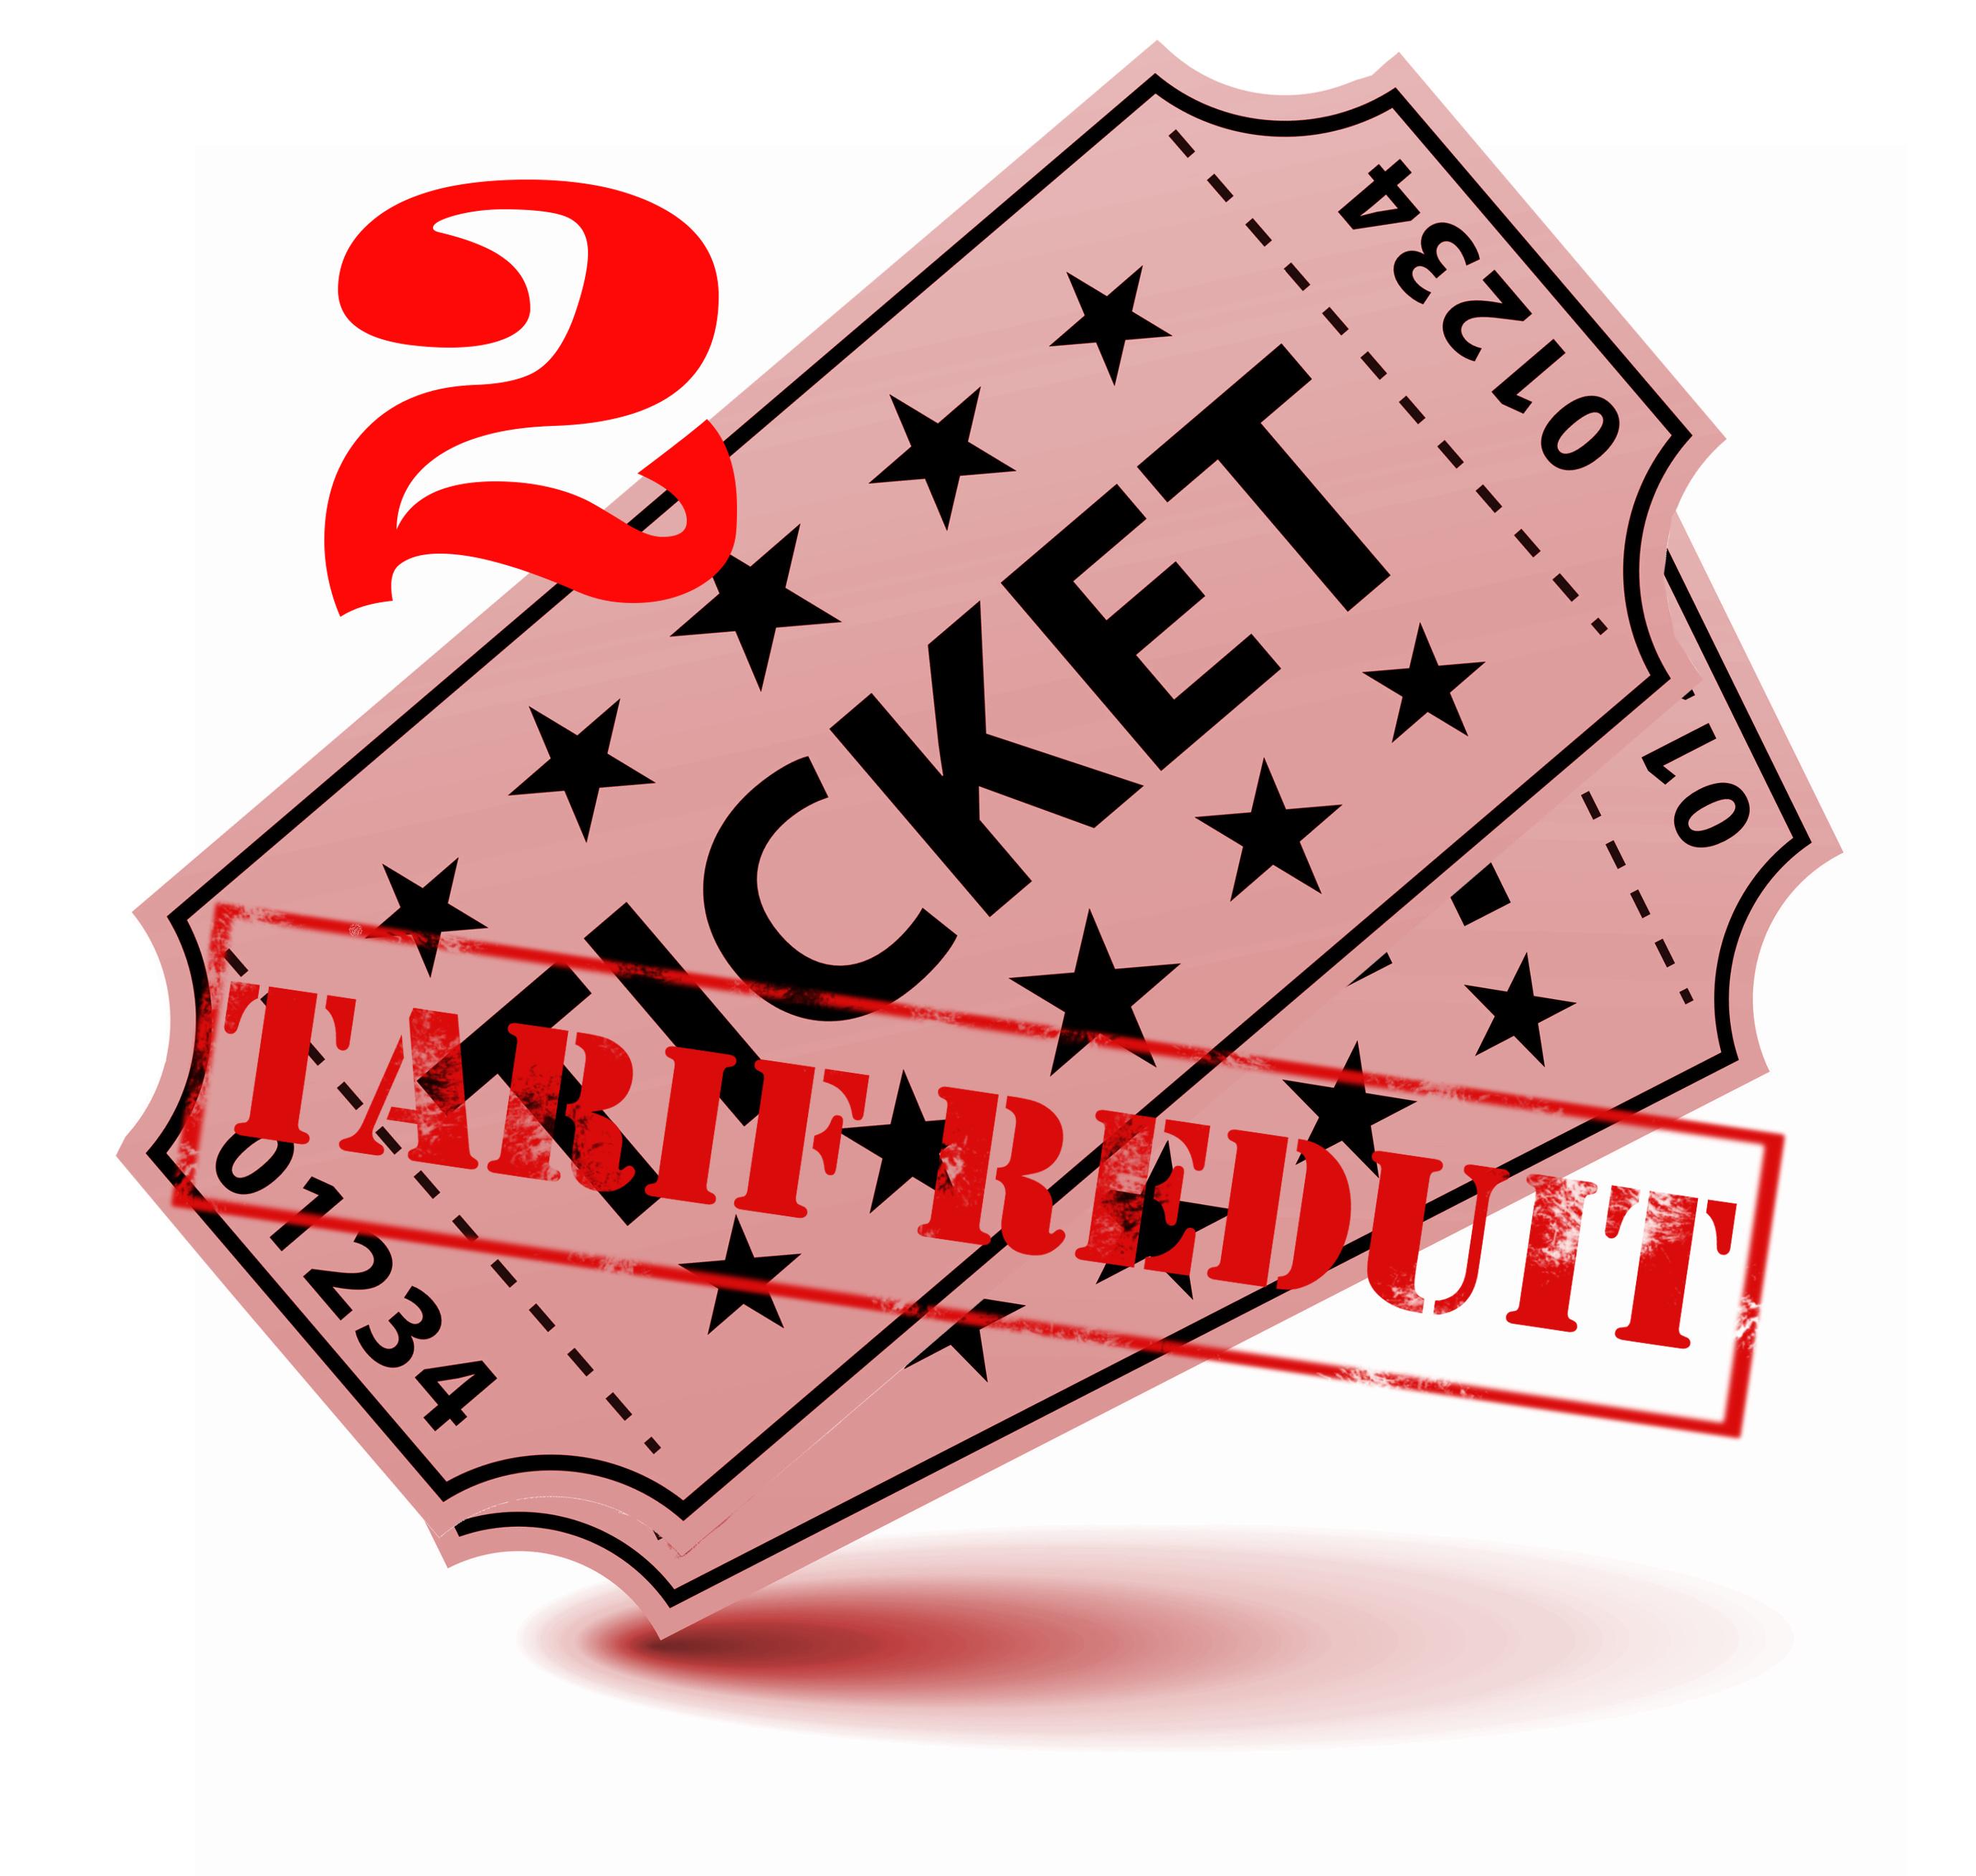 2tickets-offerts-1464617203.jpg